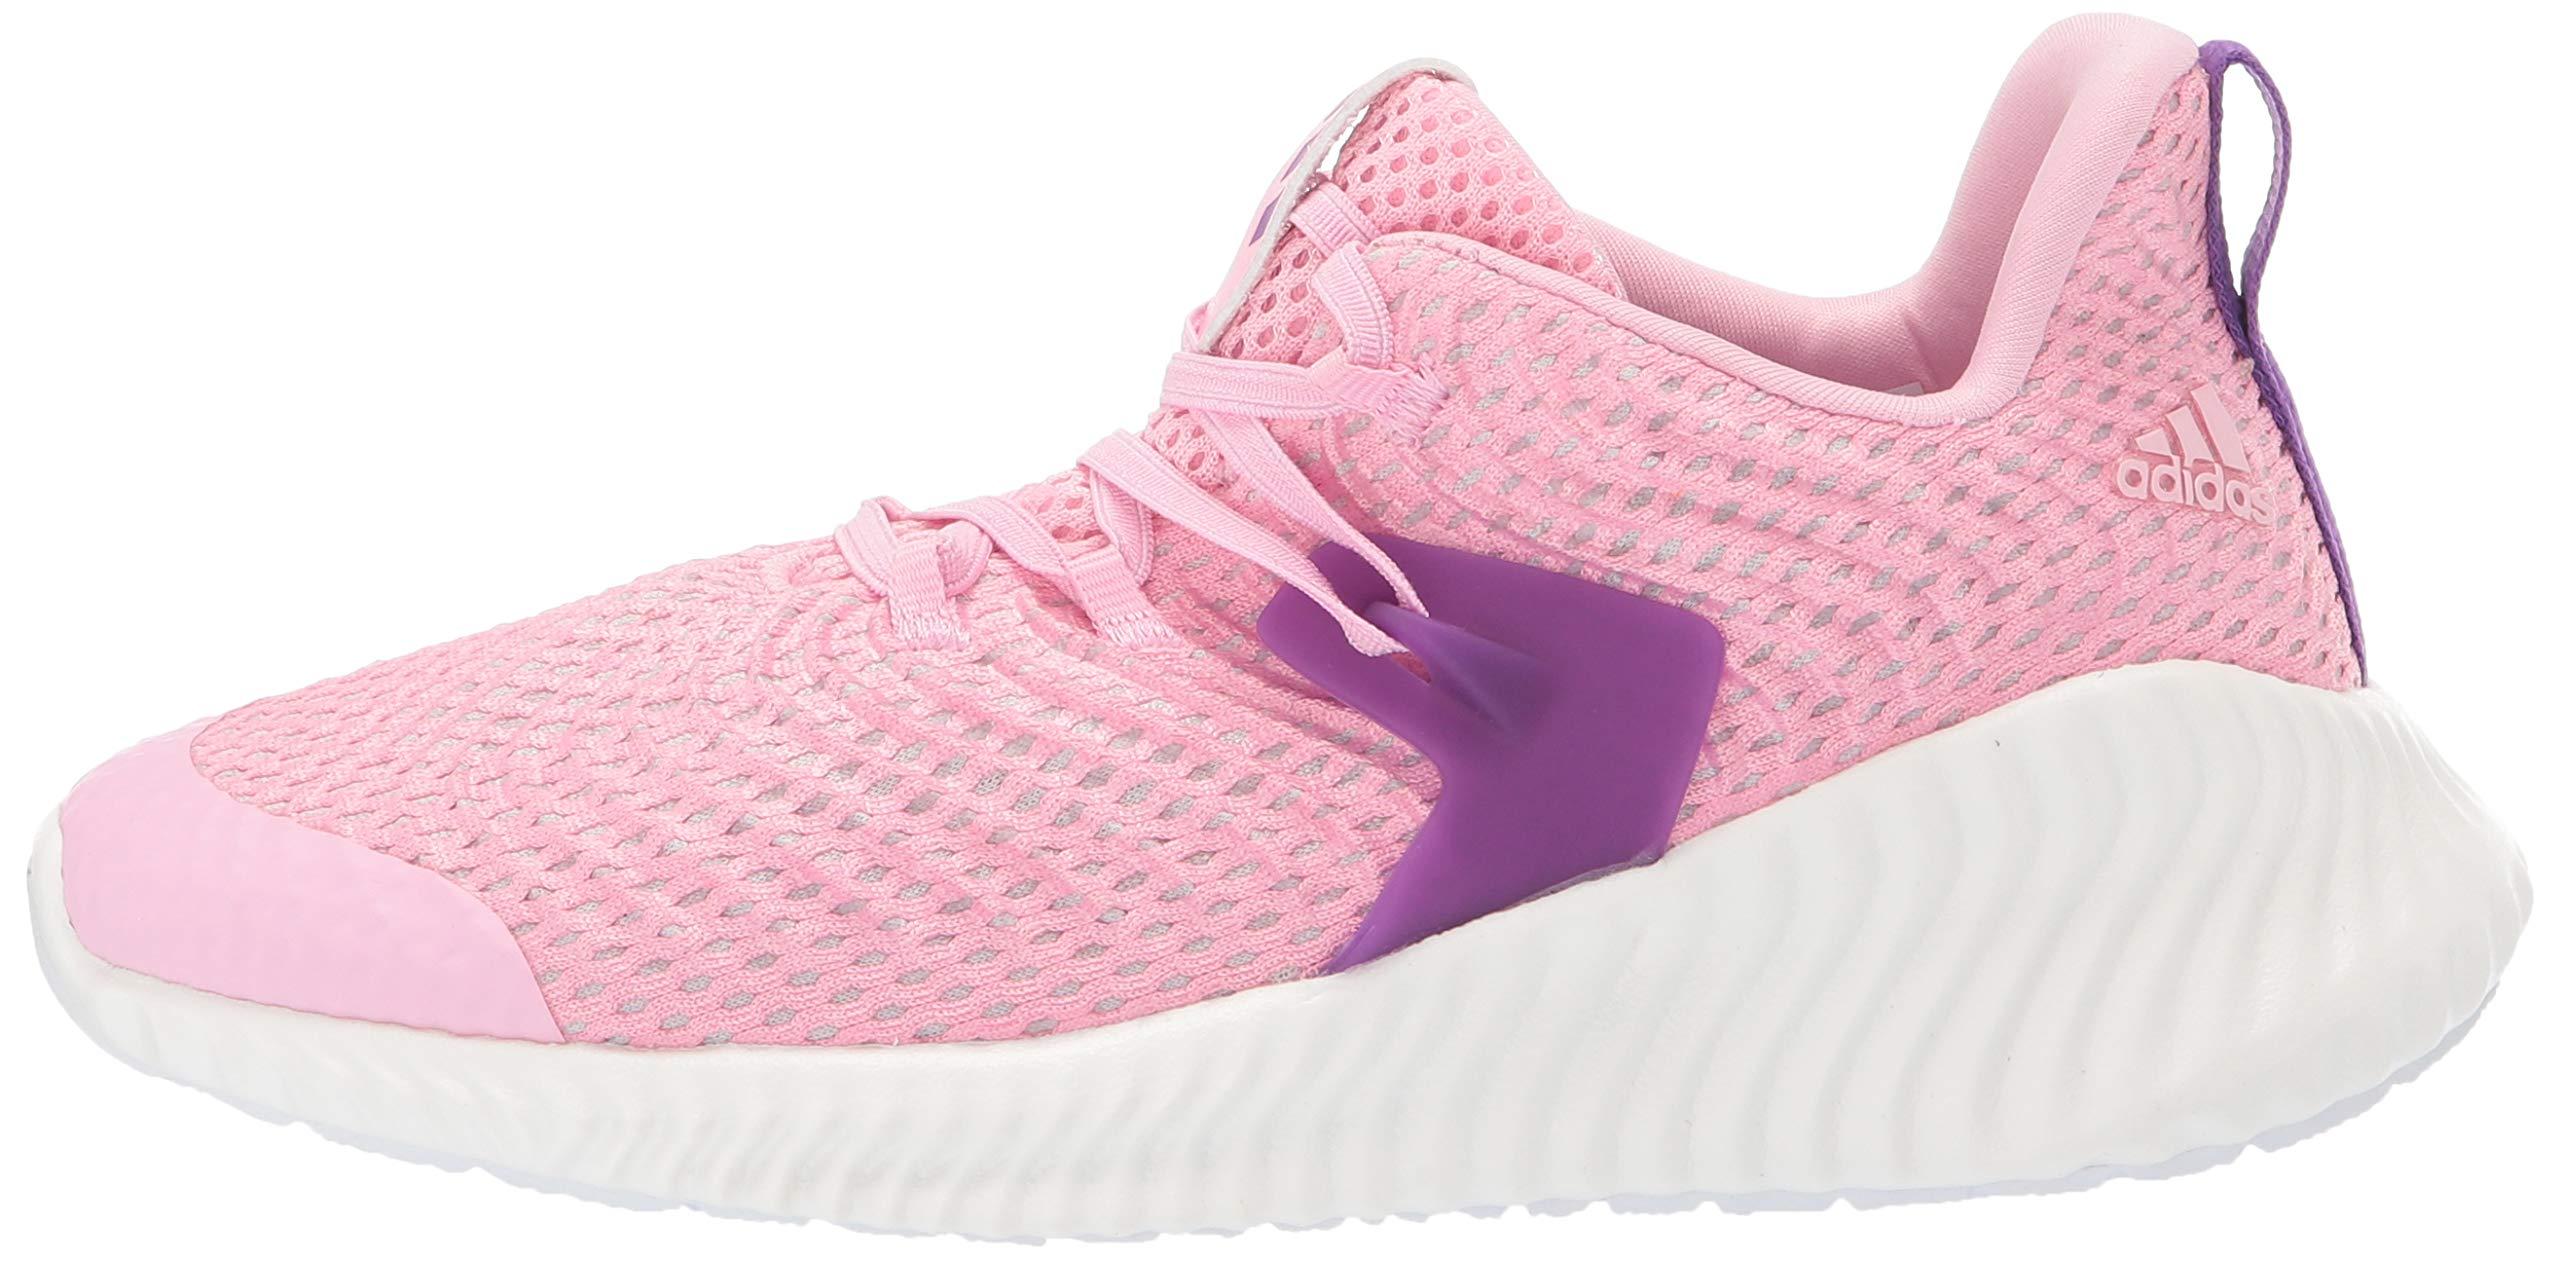 Adidas Kids Alphabounce Instinct, true pink/active purple/cloud white 2.5 M US Little Kid by adidas (Image #5)